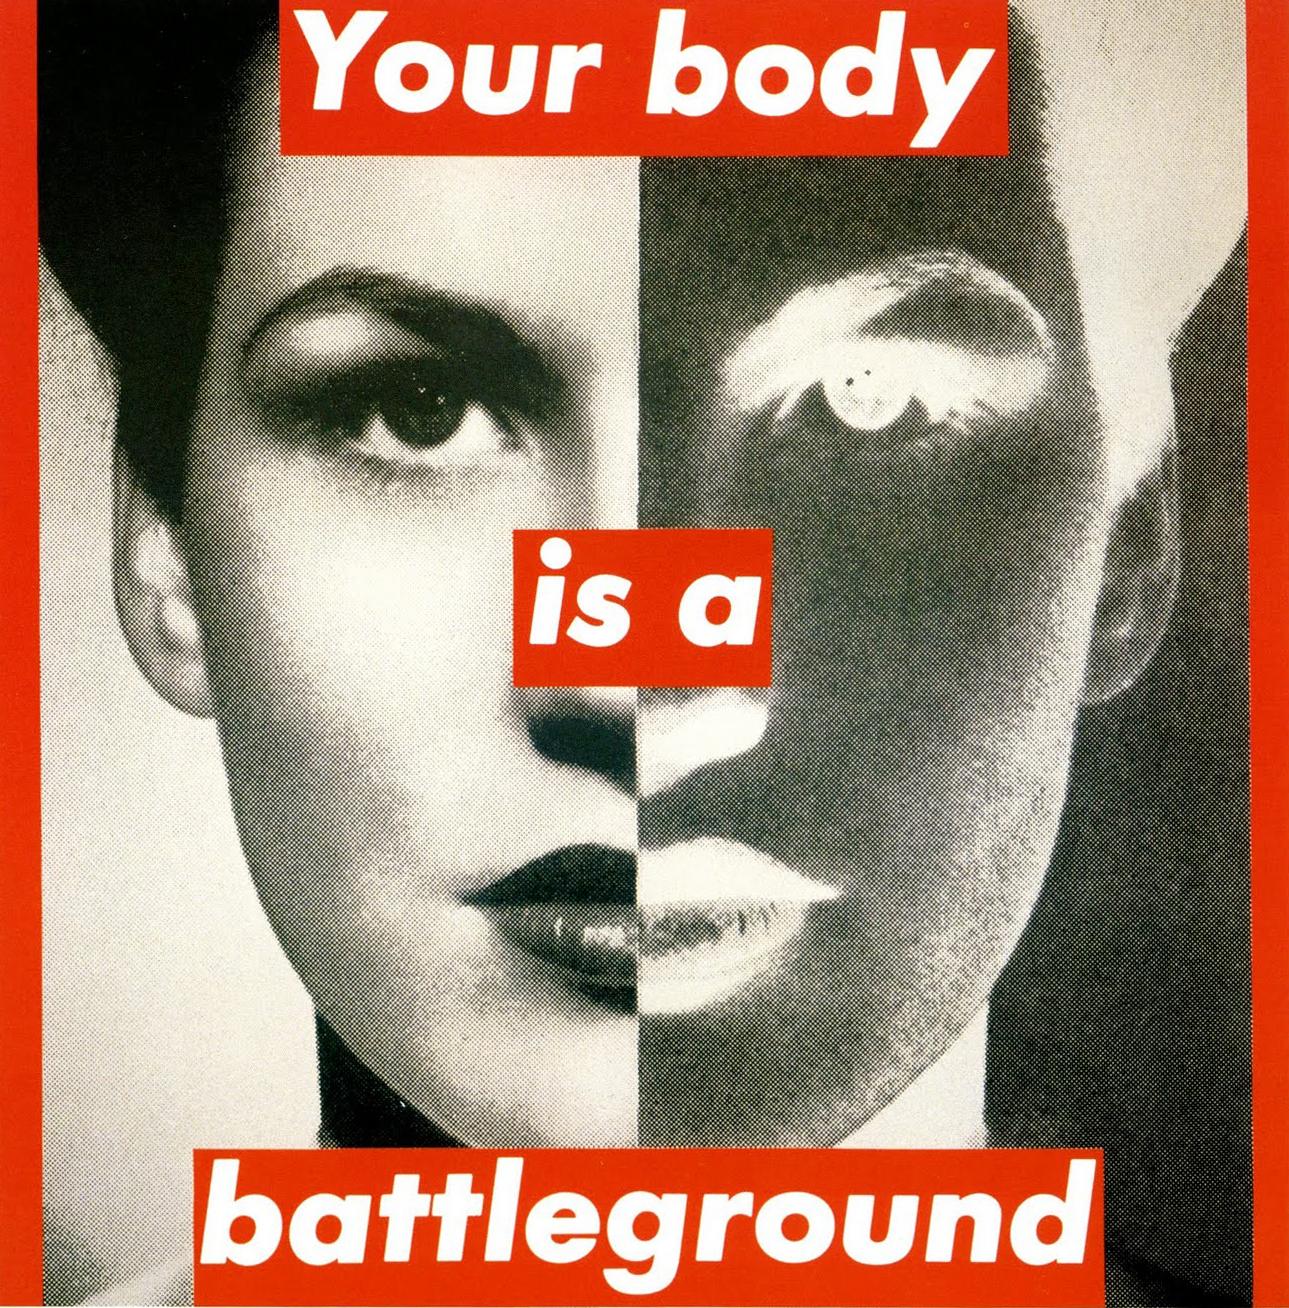 10.barbara-kruger-your-body-is-a-battleground-19891